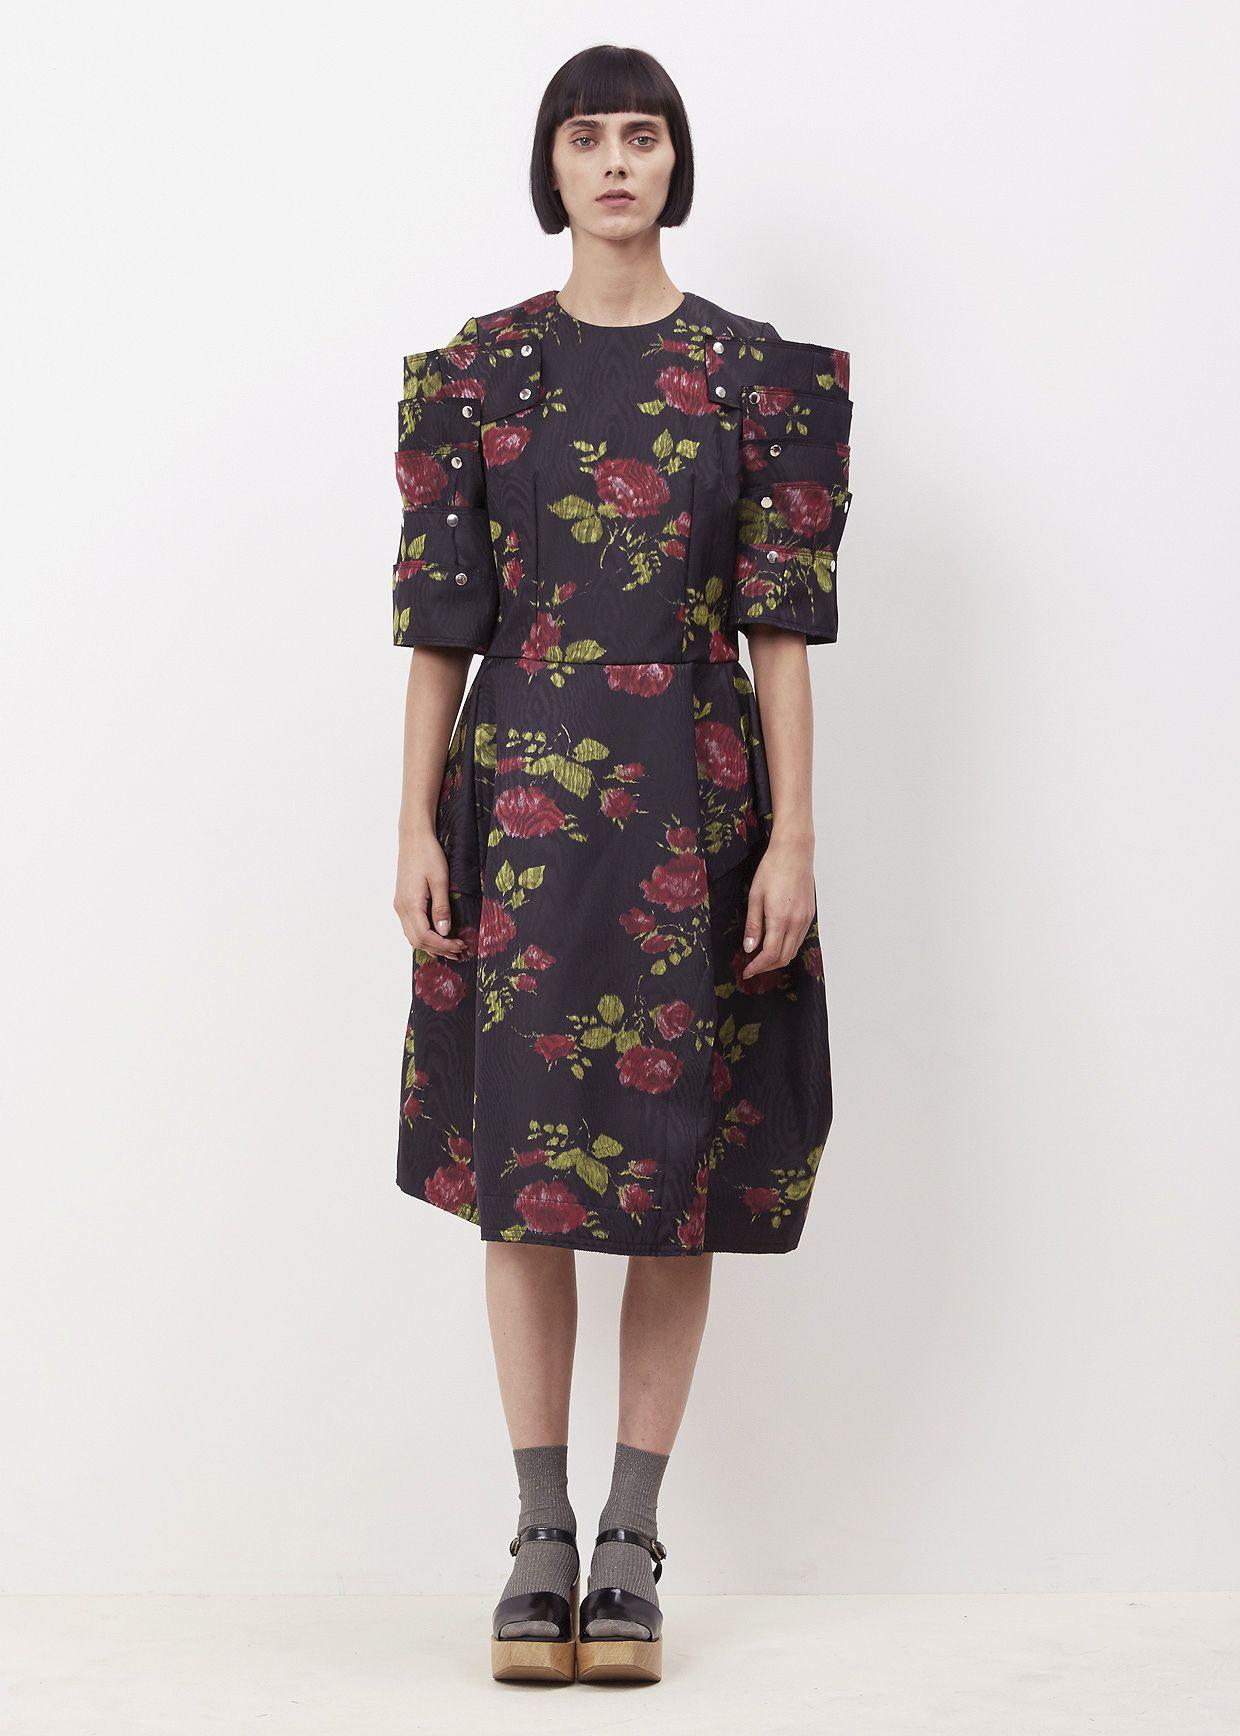 Totokaelo - Comme des Garcons GIRL Black Multi Floral Dress